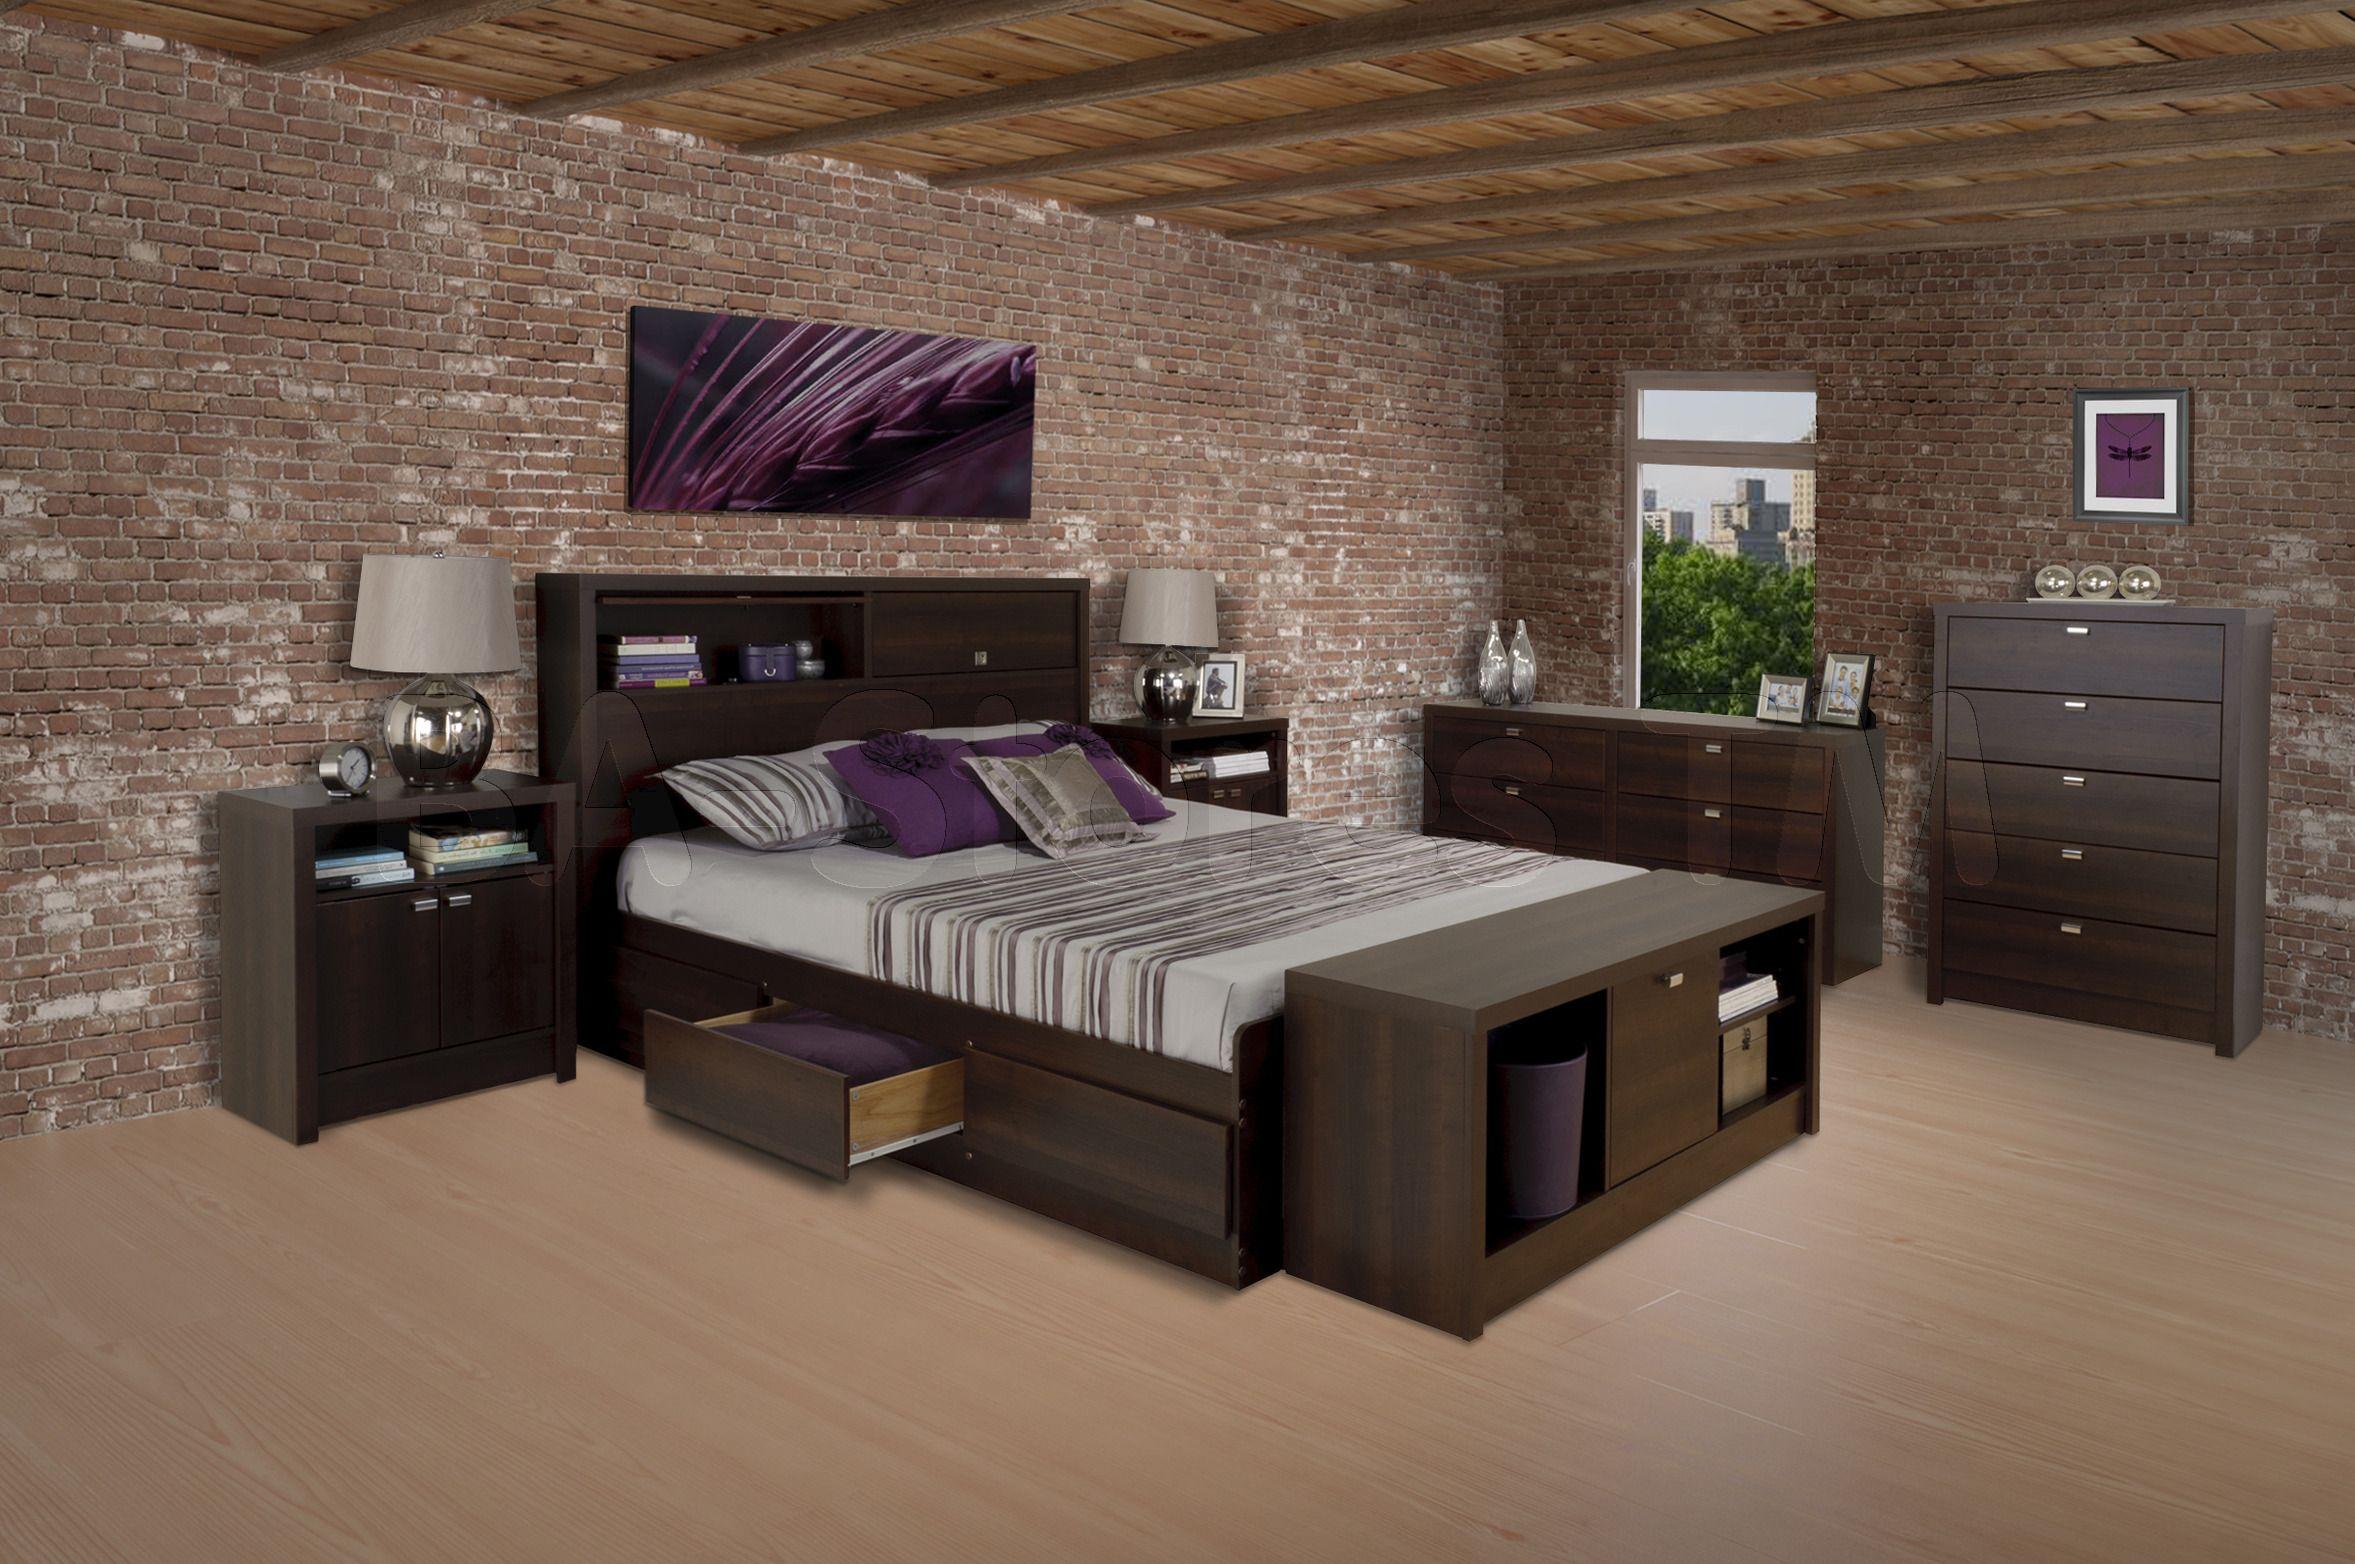 Designer Bedroom Sets Prepac Espresso Series 9 Designer Bedroom Set  Prepac Furniture